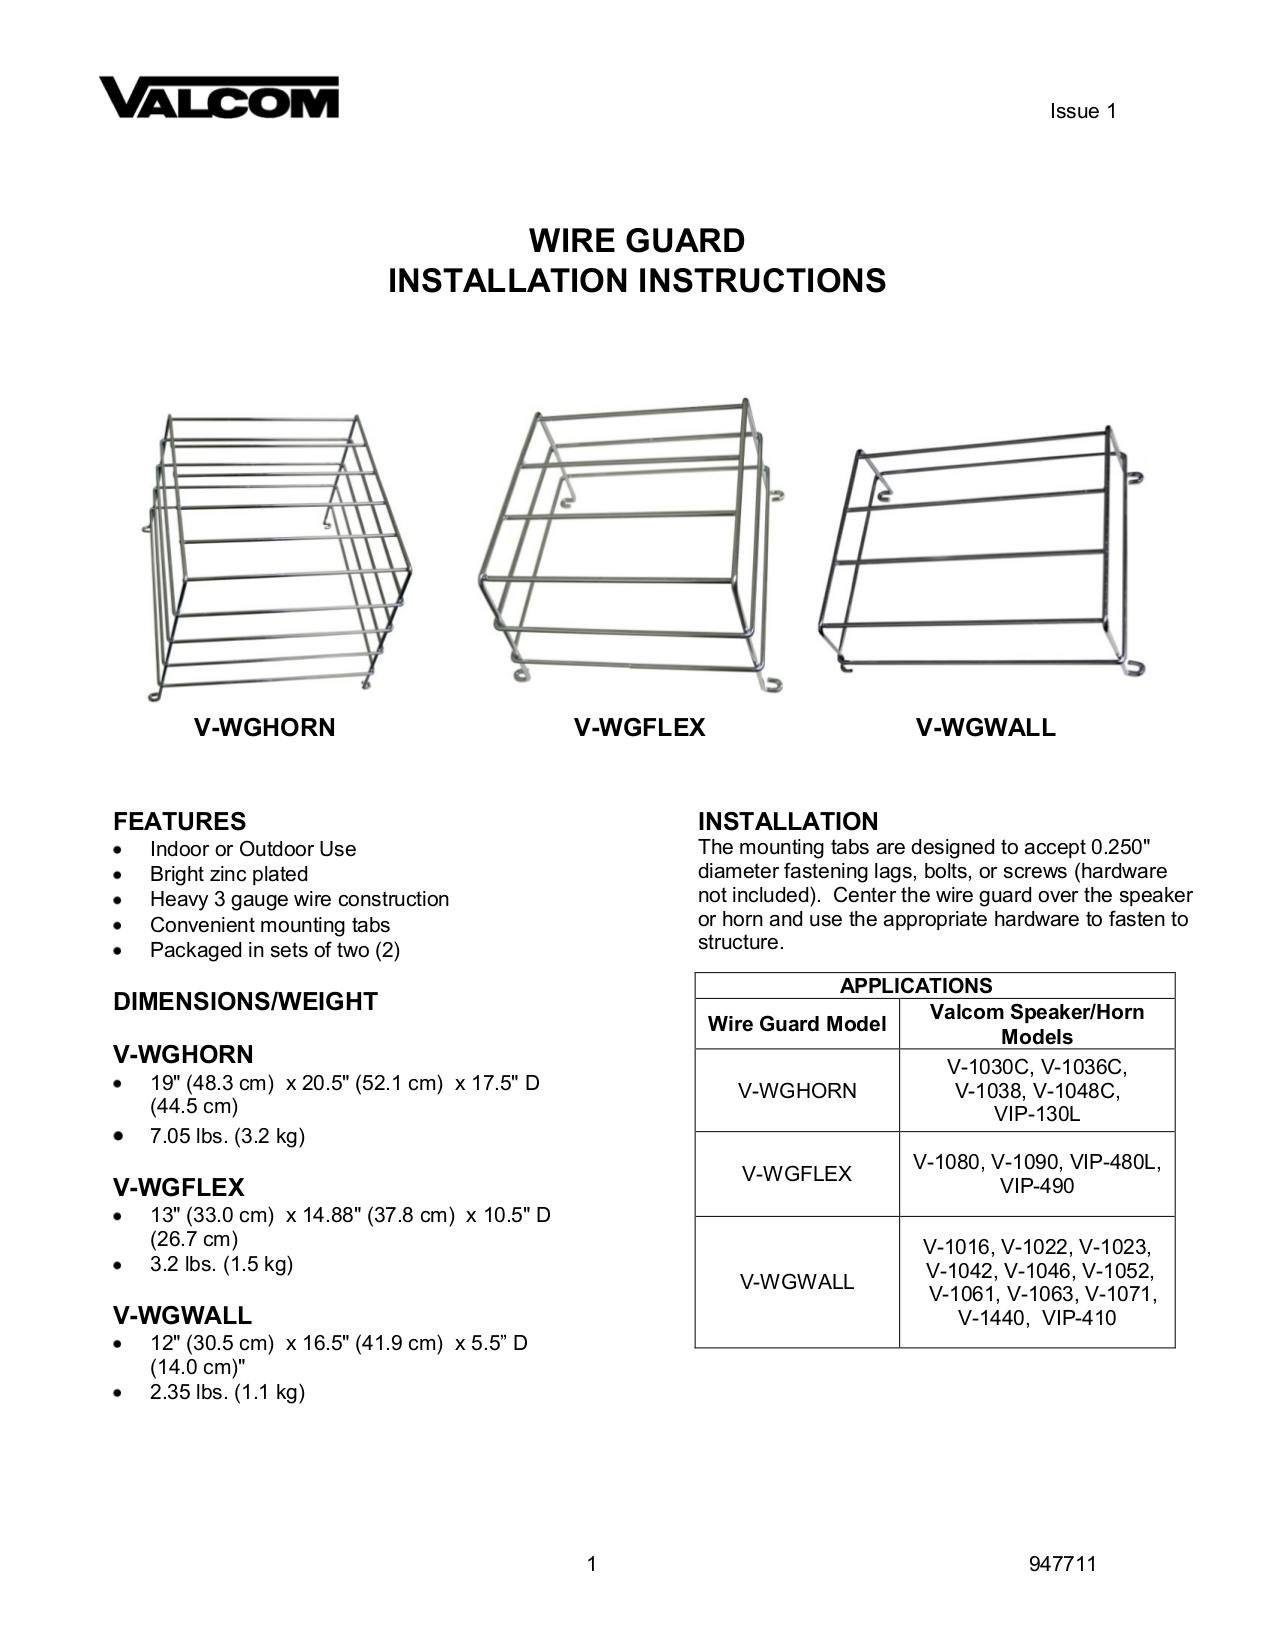 Download free pdf for Valcom V1440 Speaker manual